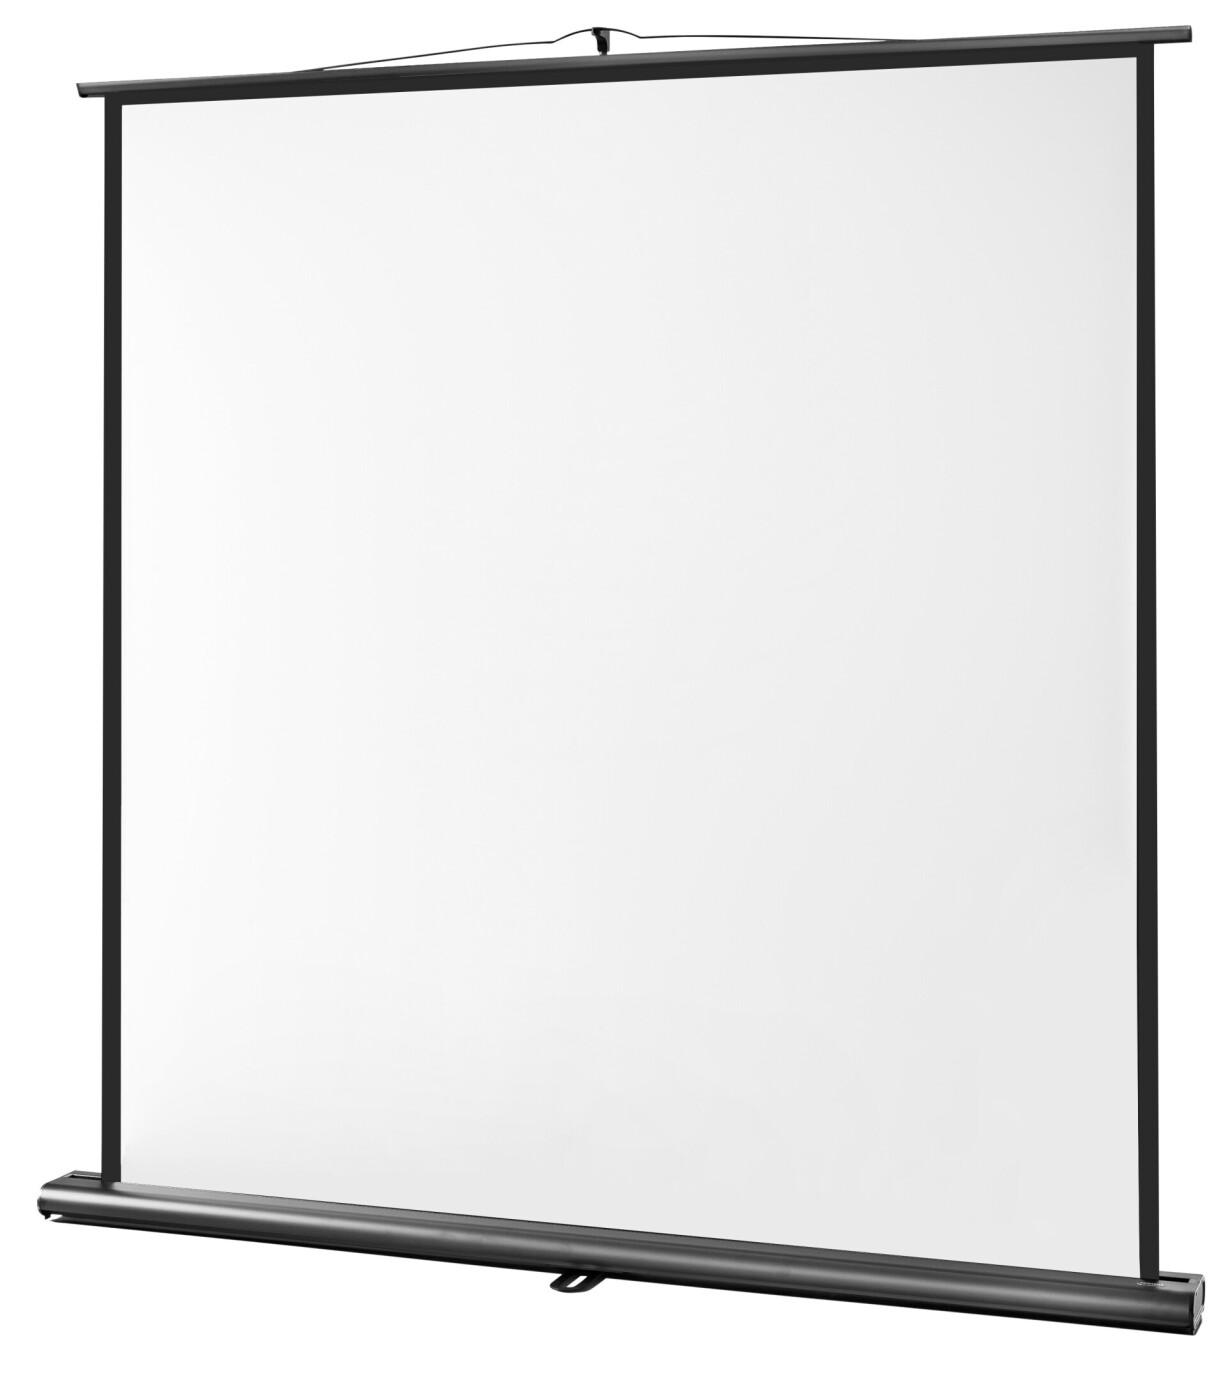 celexon projectiescherm Ultramobil Professional 200 x 200 cm